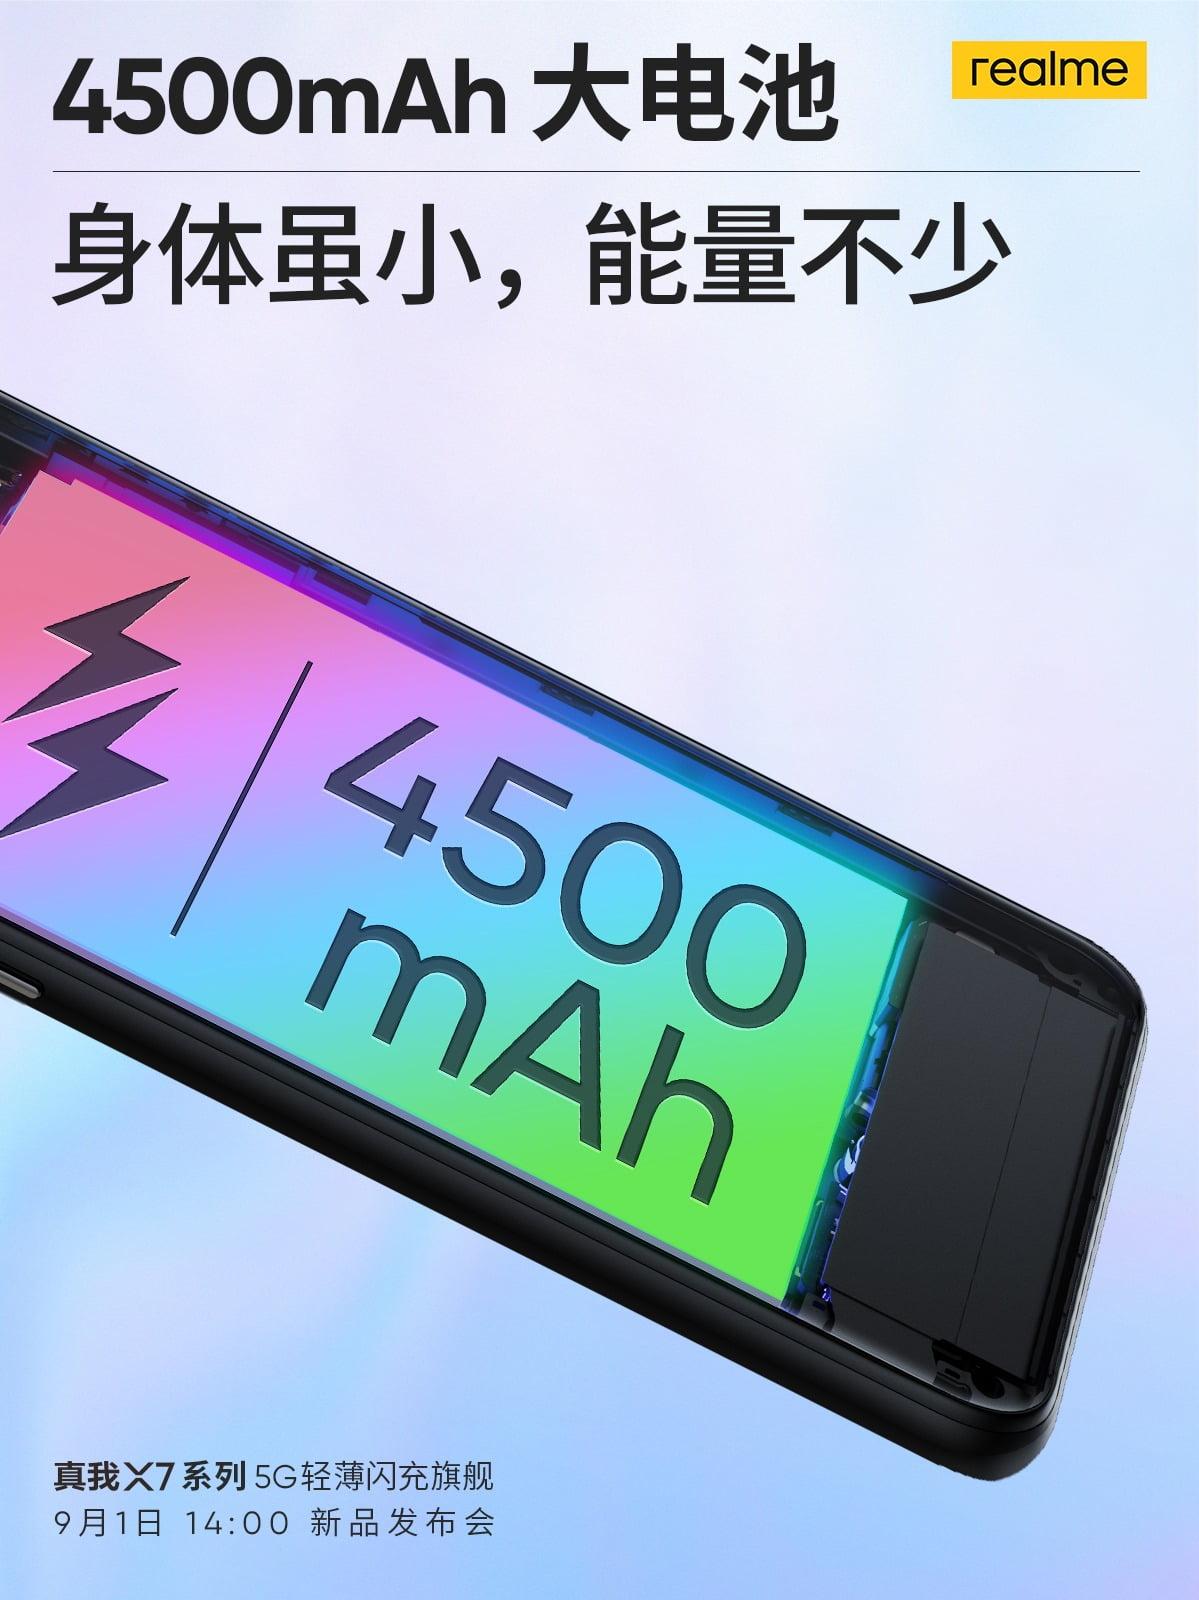 Realme X7 Series